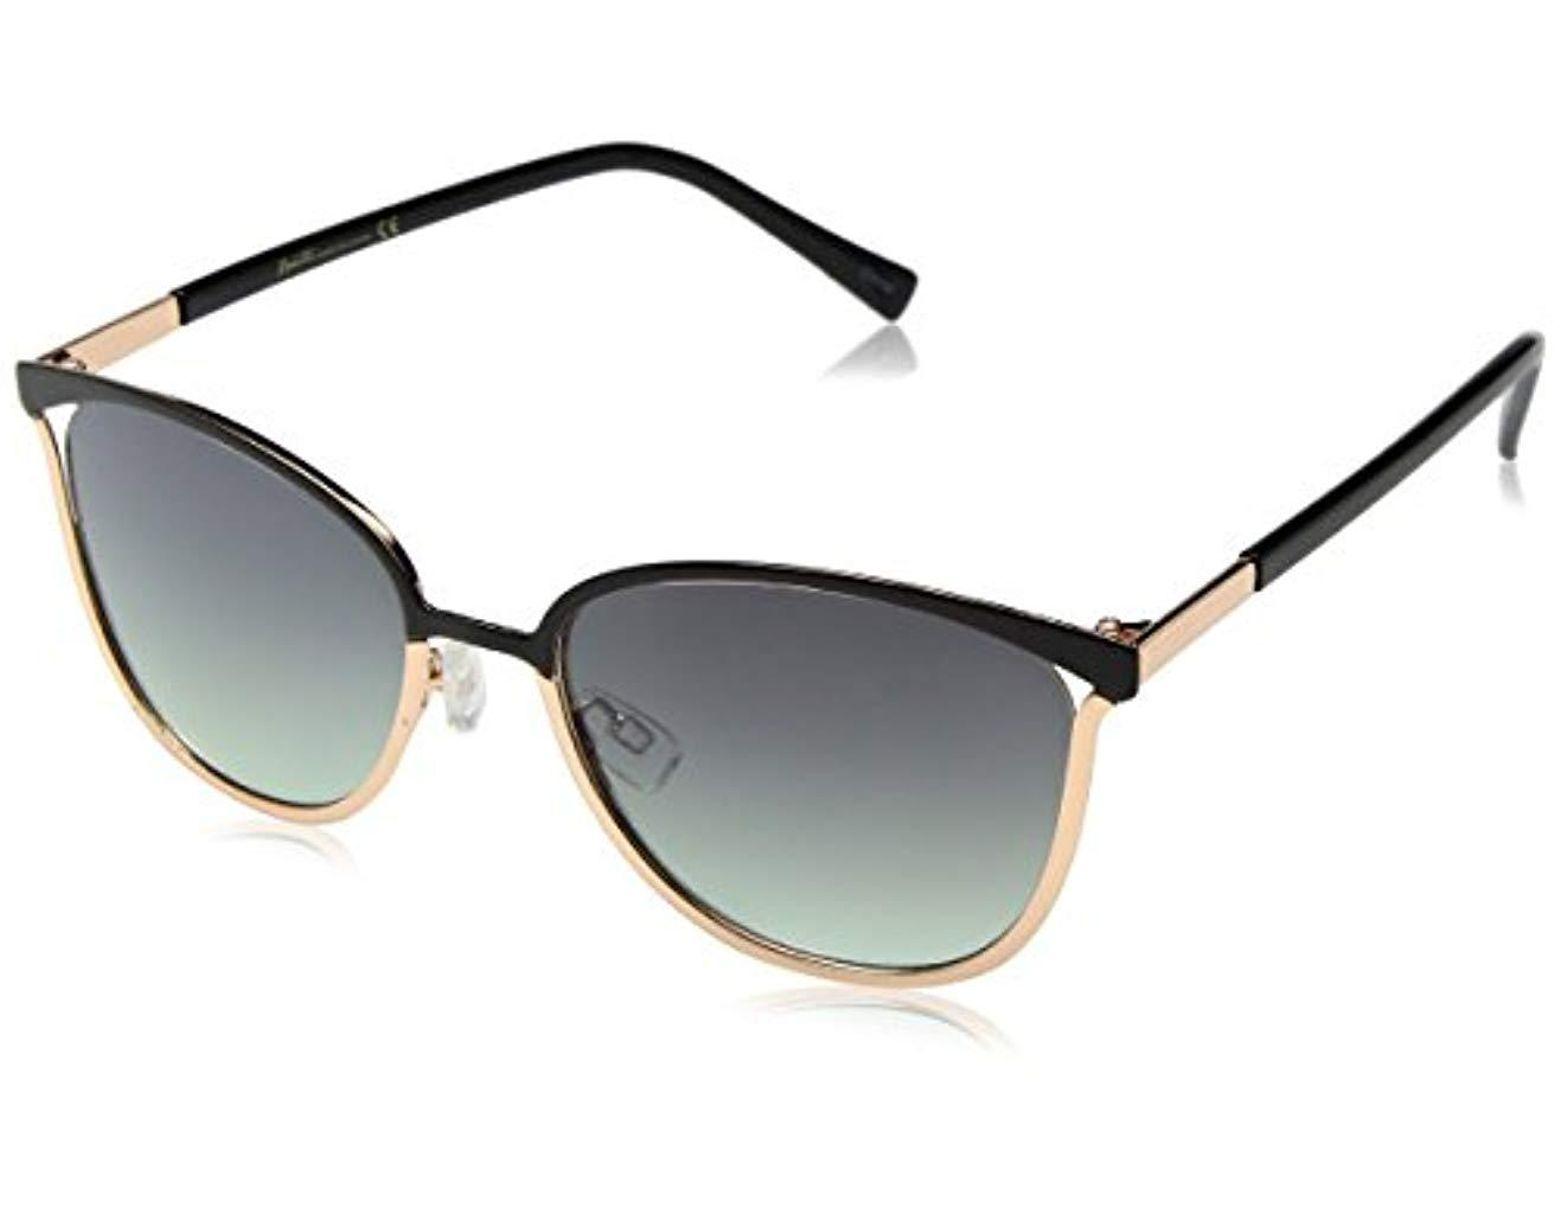 a7e4981f4 Nanette Nanette Lepore Nanette By Nanette Lepore Nn219 Oxrgd Cateye  Sunglasses, Black/rose Gold, 55 Mm in Black - Save 6% - Lyst